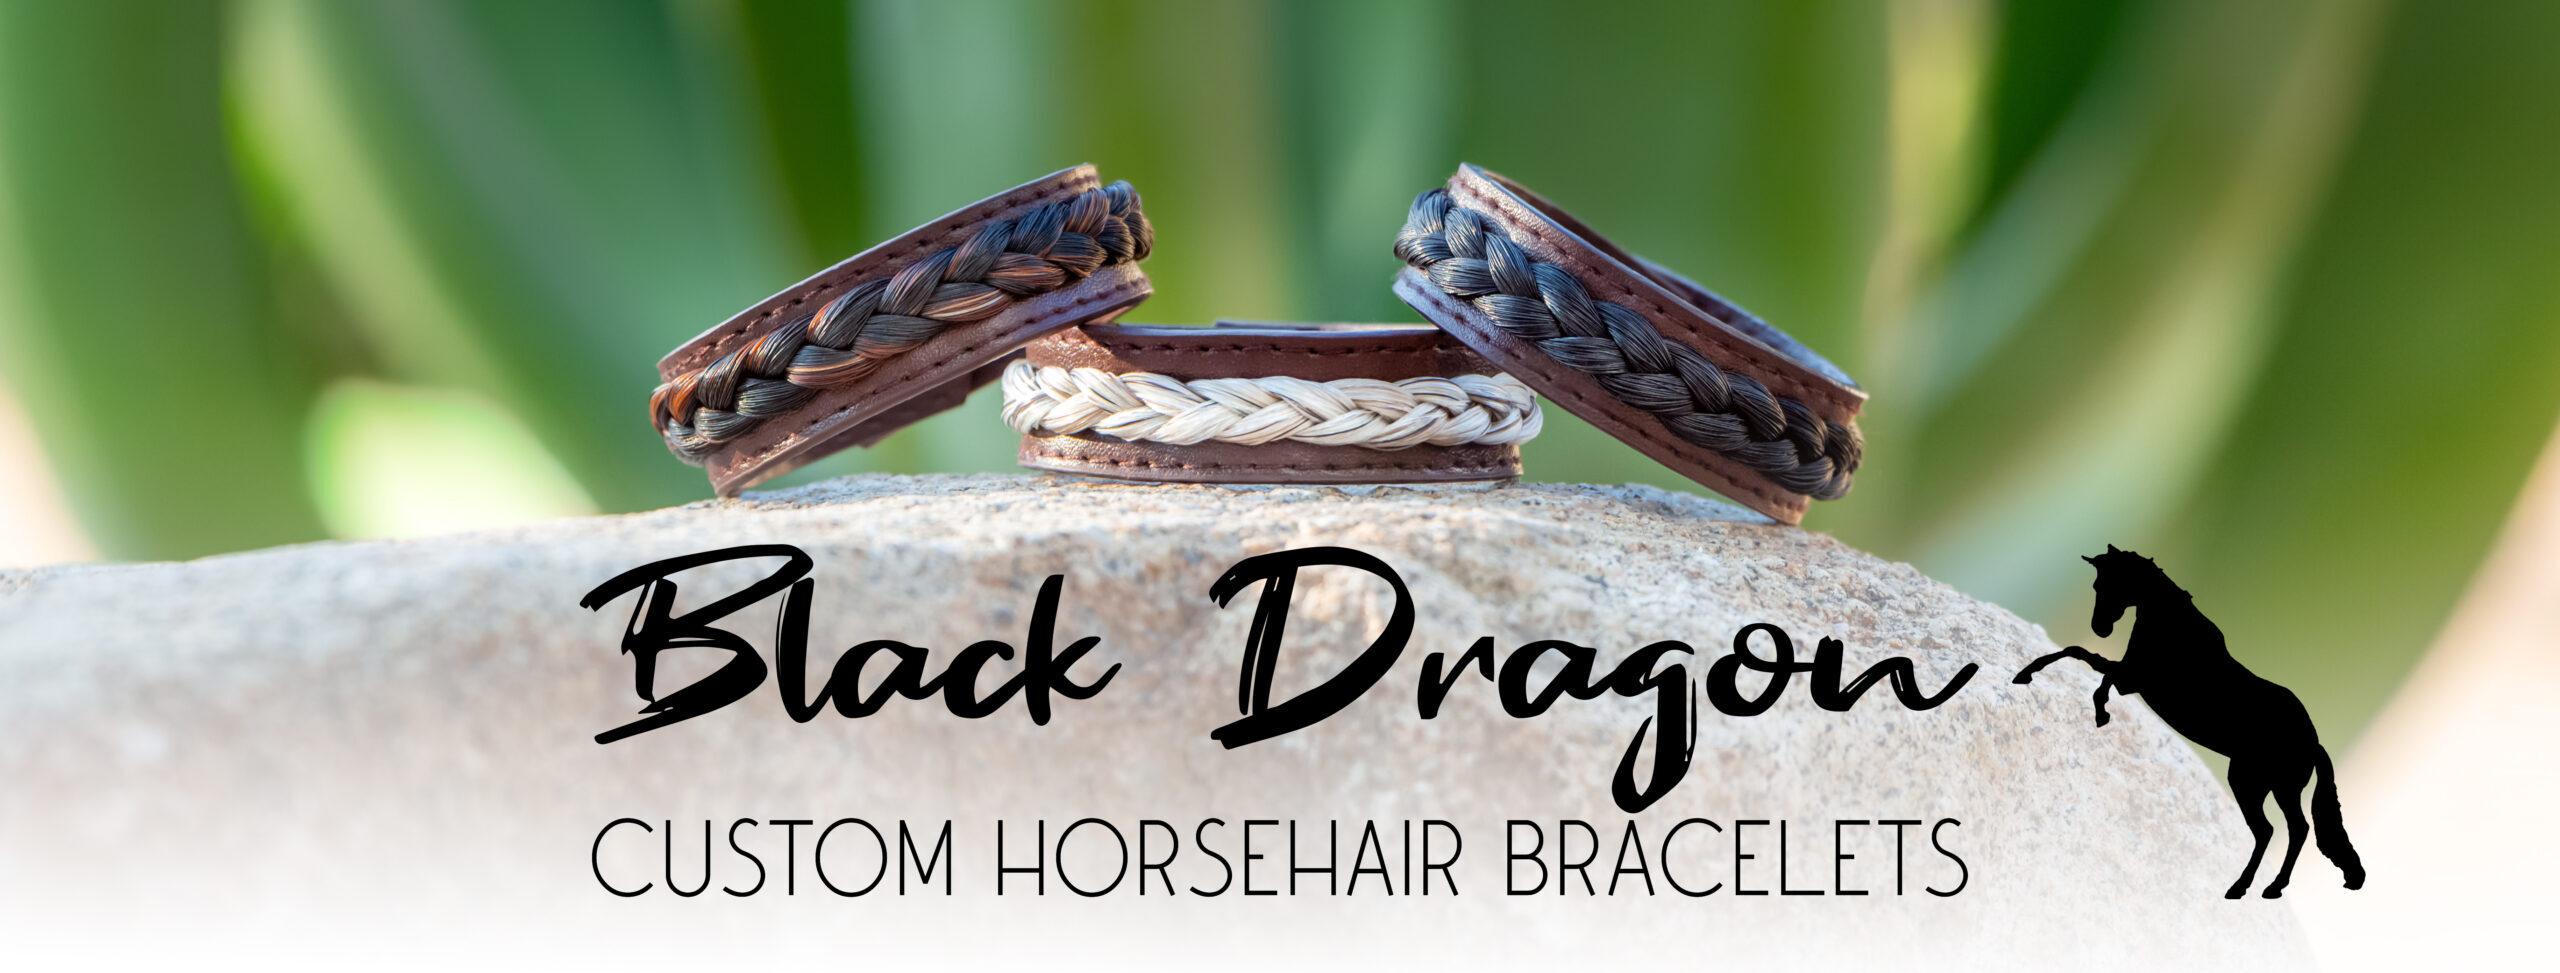 Black Dragon Custom Horsehair Bracelets